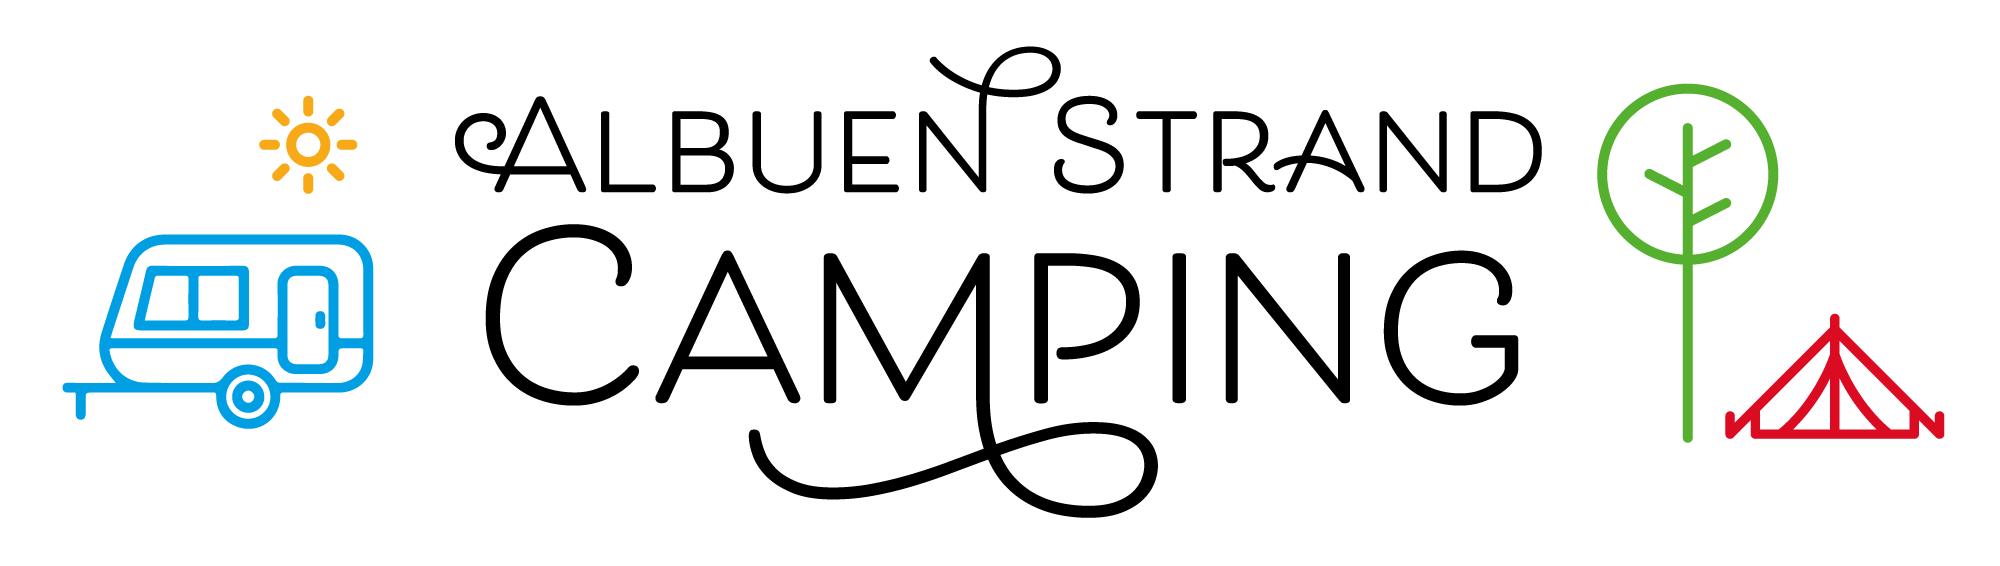 Albuen Strand Camping